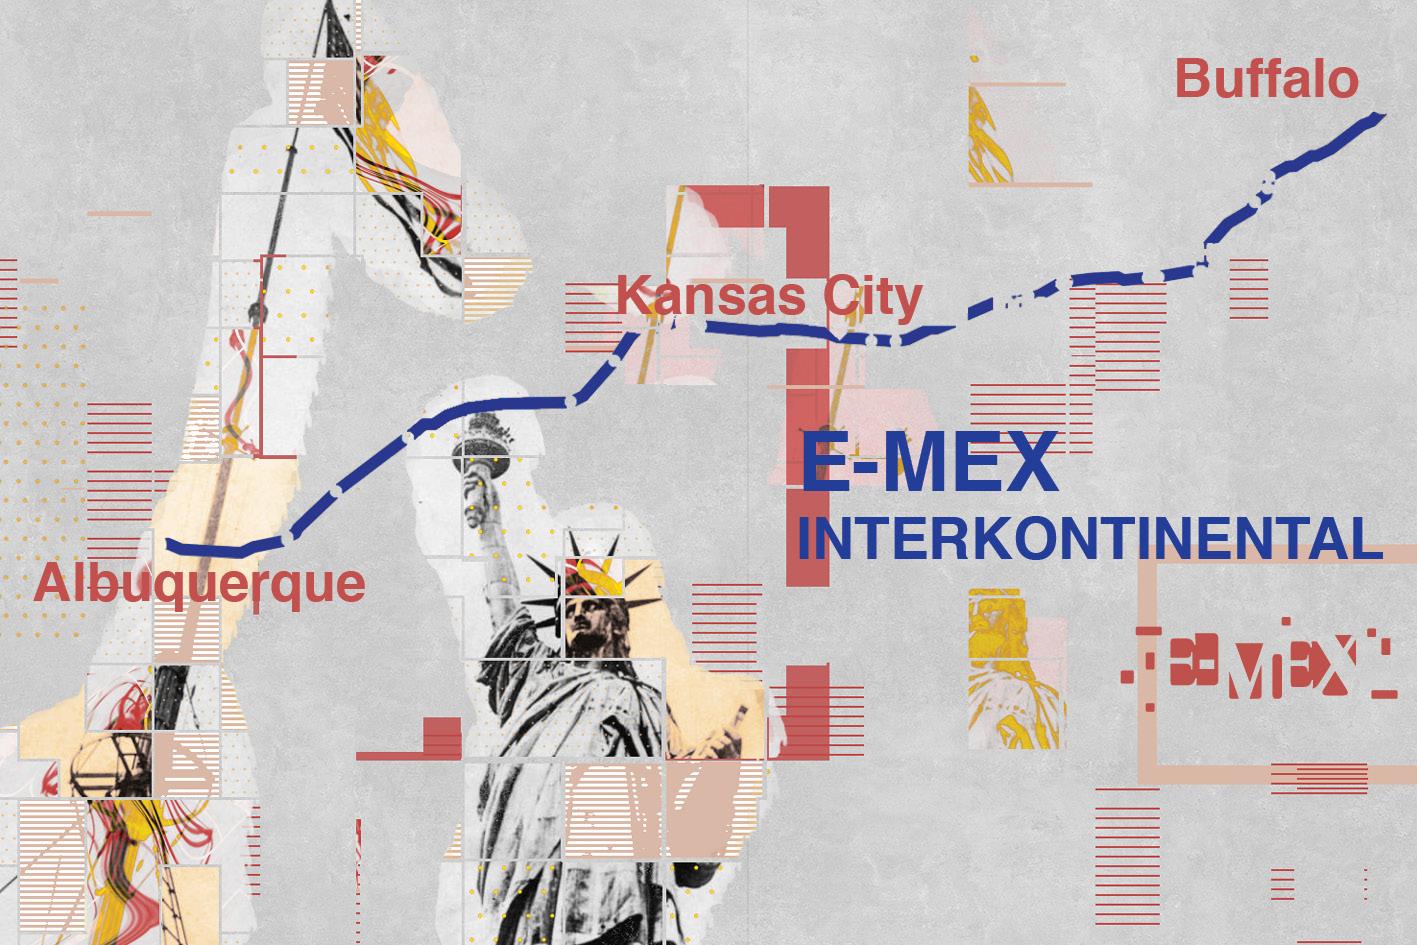 E-MEX INTERKONTINENTAL  USA-KONZERTREISE